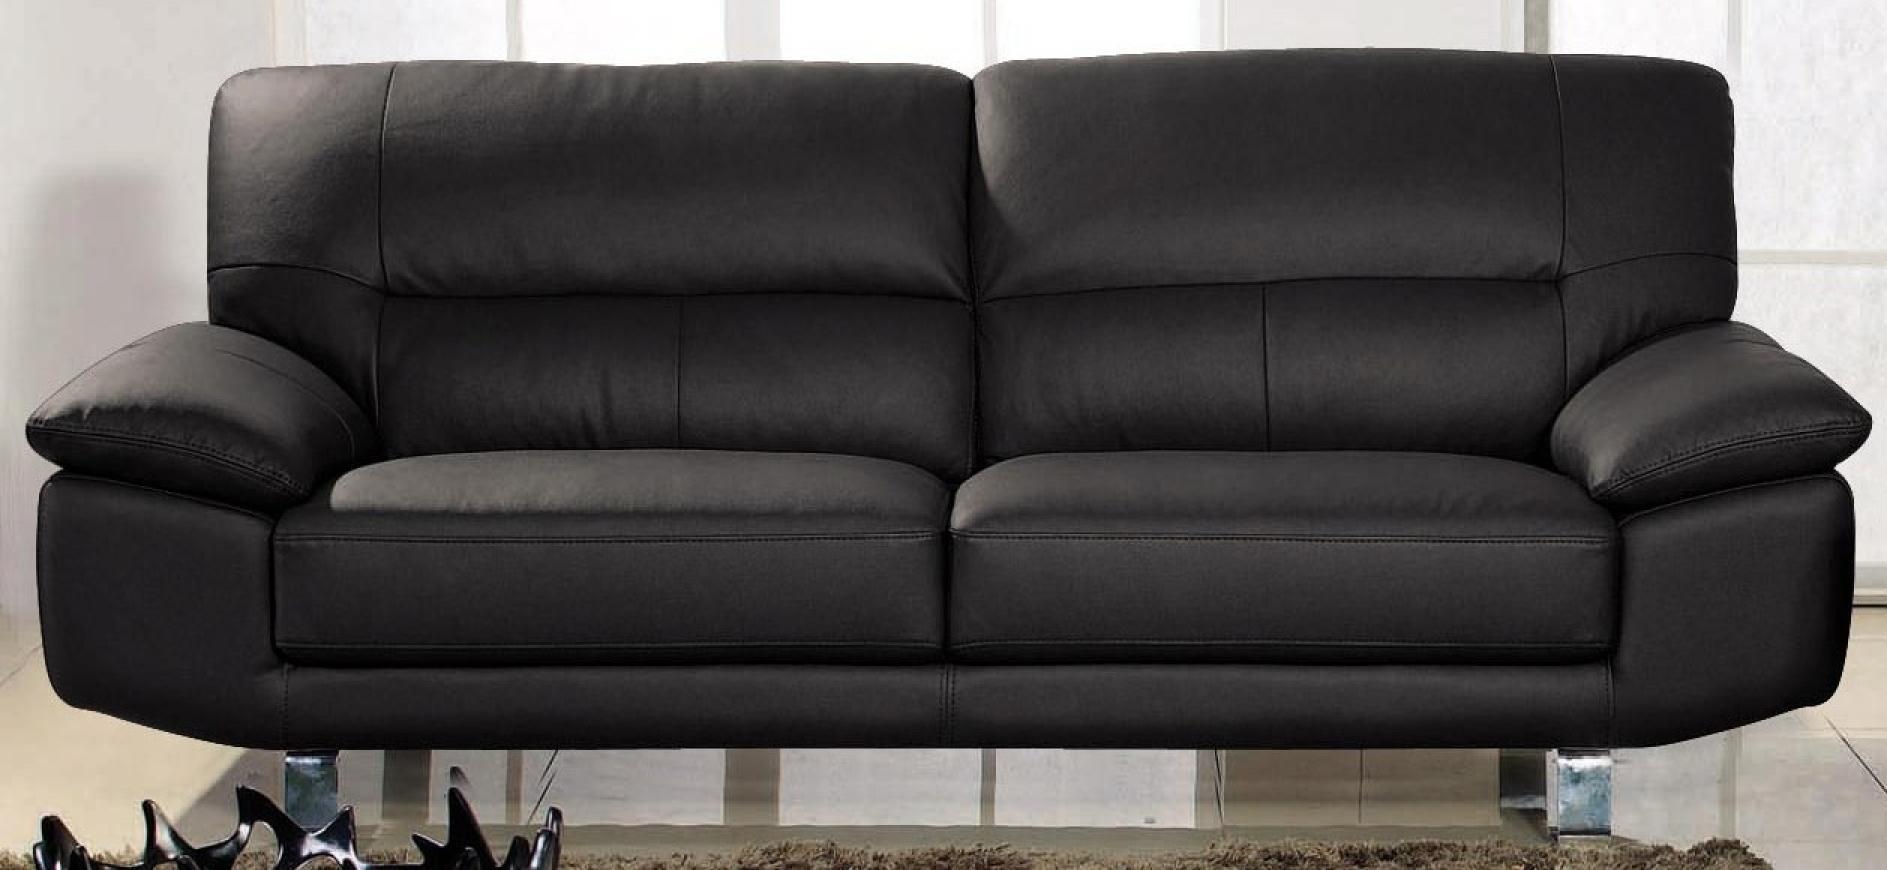 photos canap convertible cuir 3 places. Black Bedroom Furniture Sets. Home Design Ideas